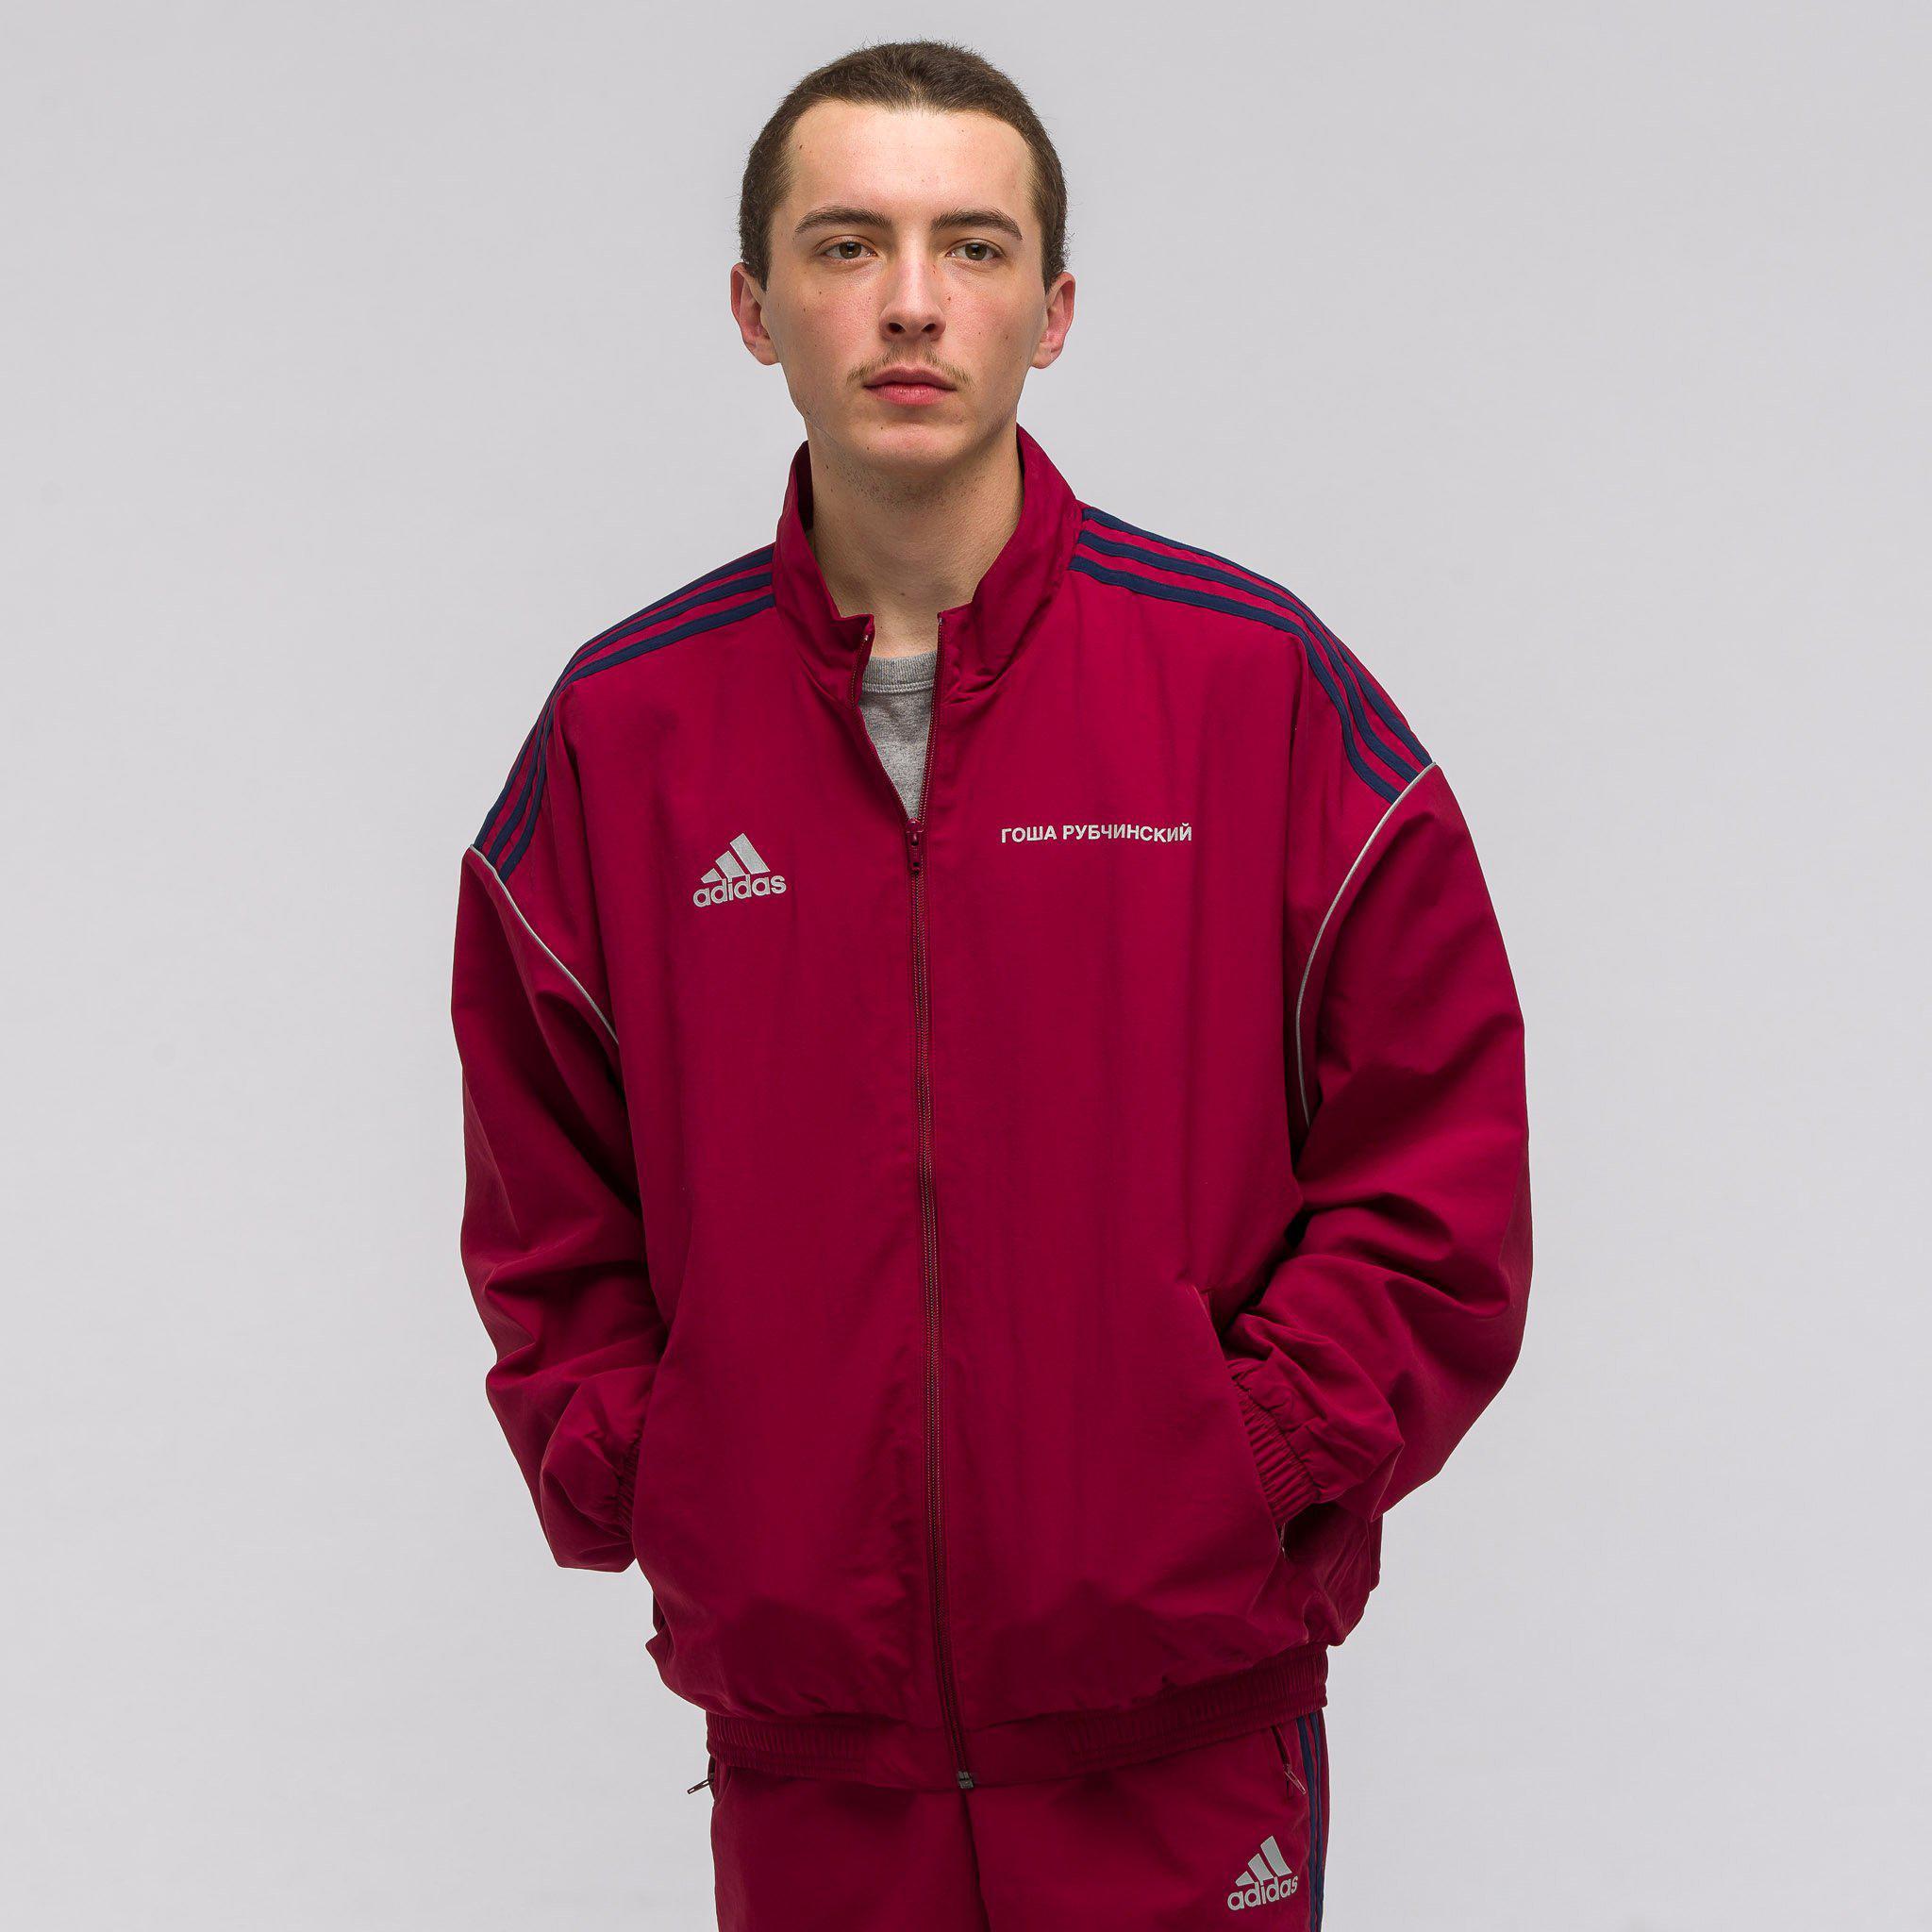 huge selection of 92bd3 5f14c Gosha Rubchinskiy  Red X Adidas Track Jacket In Burgundy for Men  Lyst